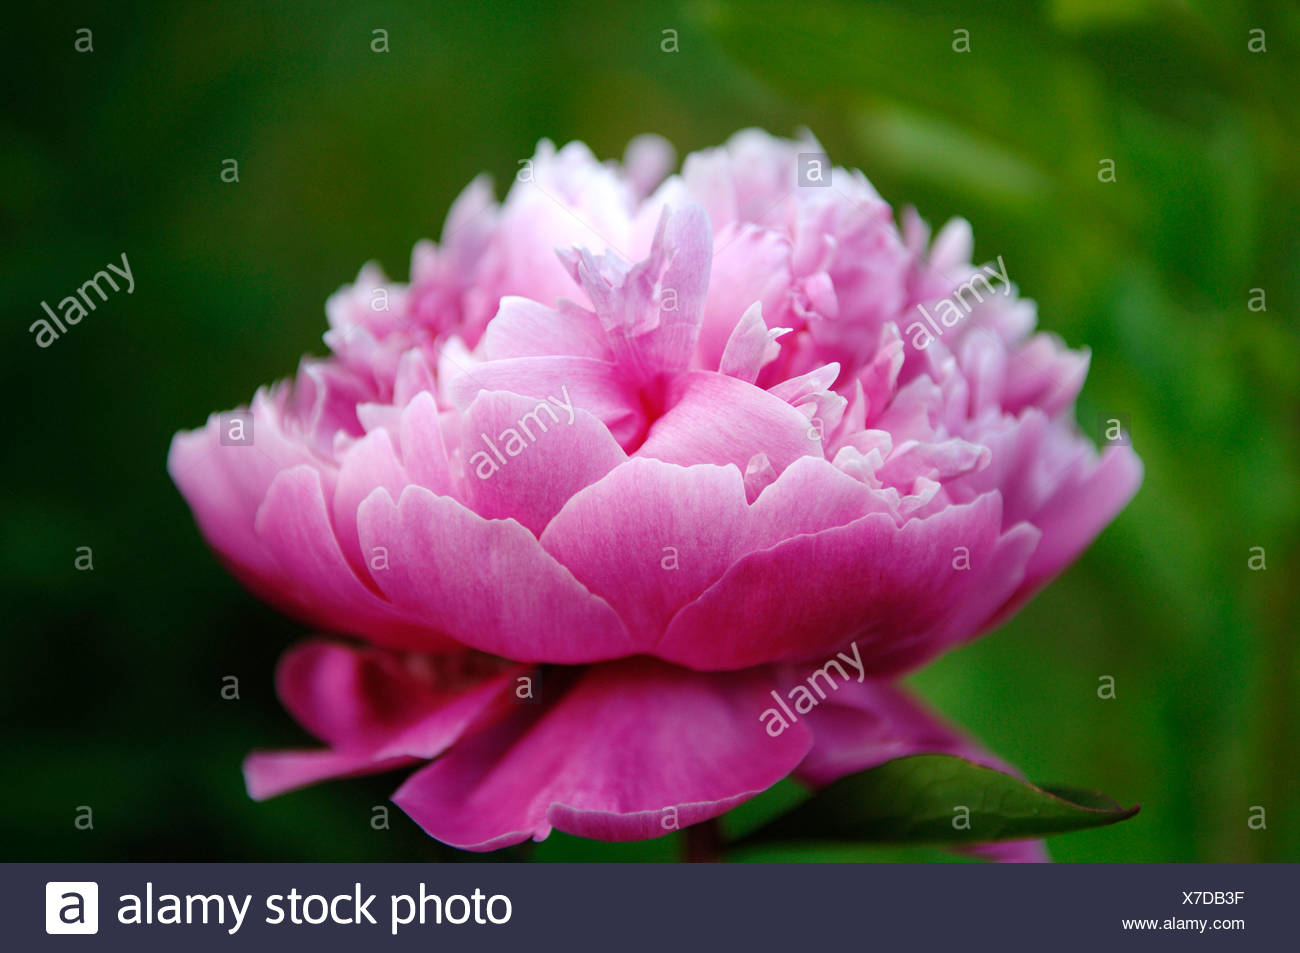 Peony or Paeony (Paeonia) blossom, Eckental Valley, Middle Franconia, Bavaria, Germany, Europe Stock Photo